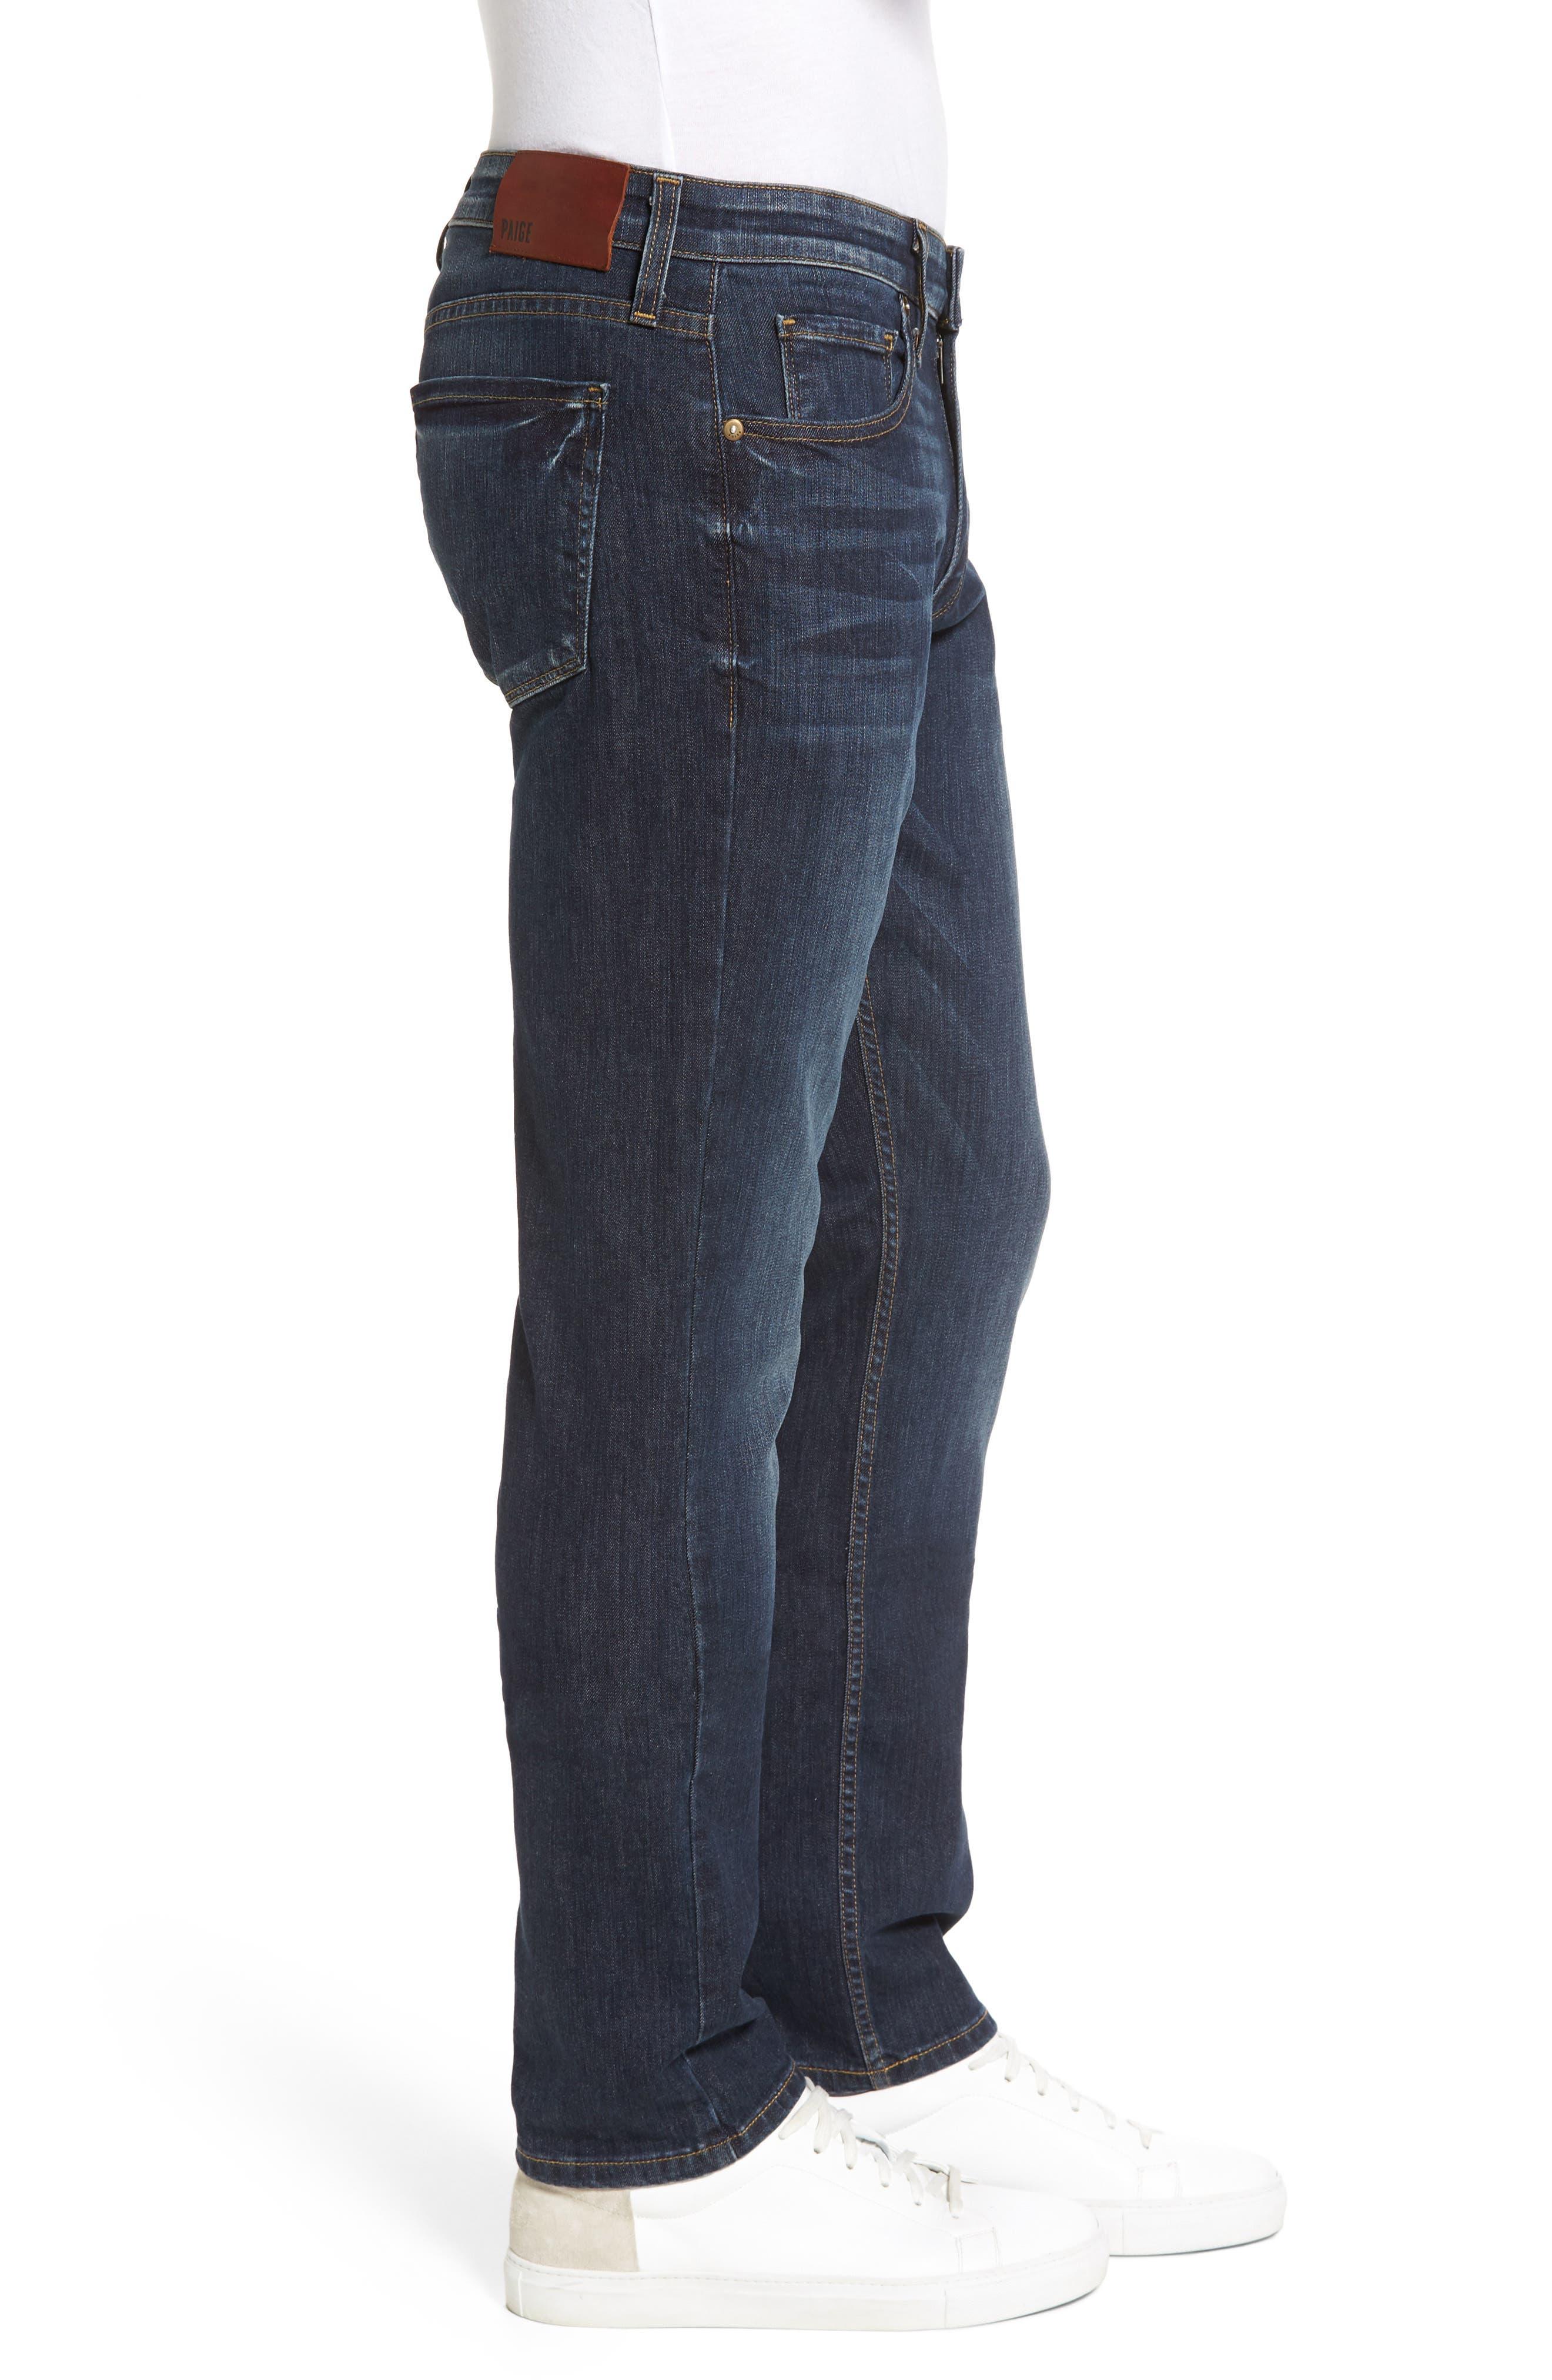 PAIGE,                             Legacy - Federal Slim Straight Leg Jeans,                             Alternate thumbnail 3, color,                             400